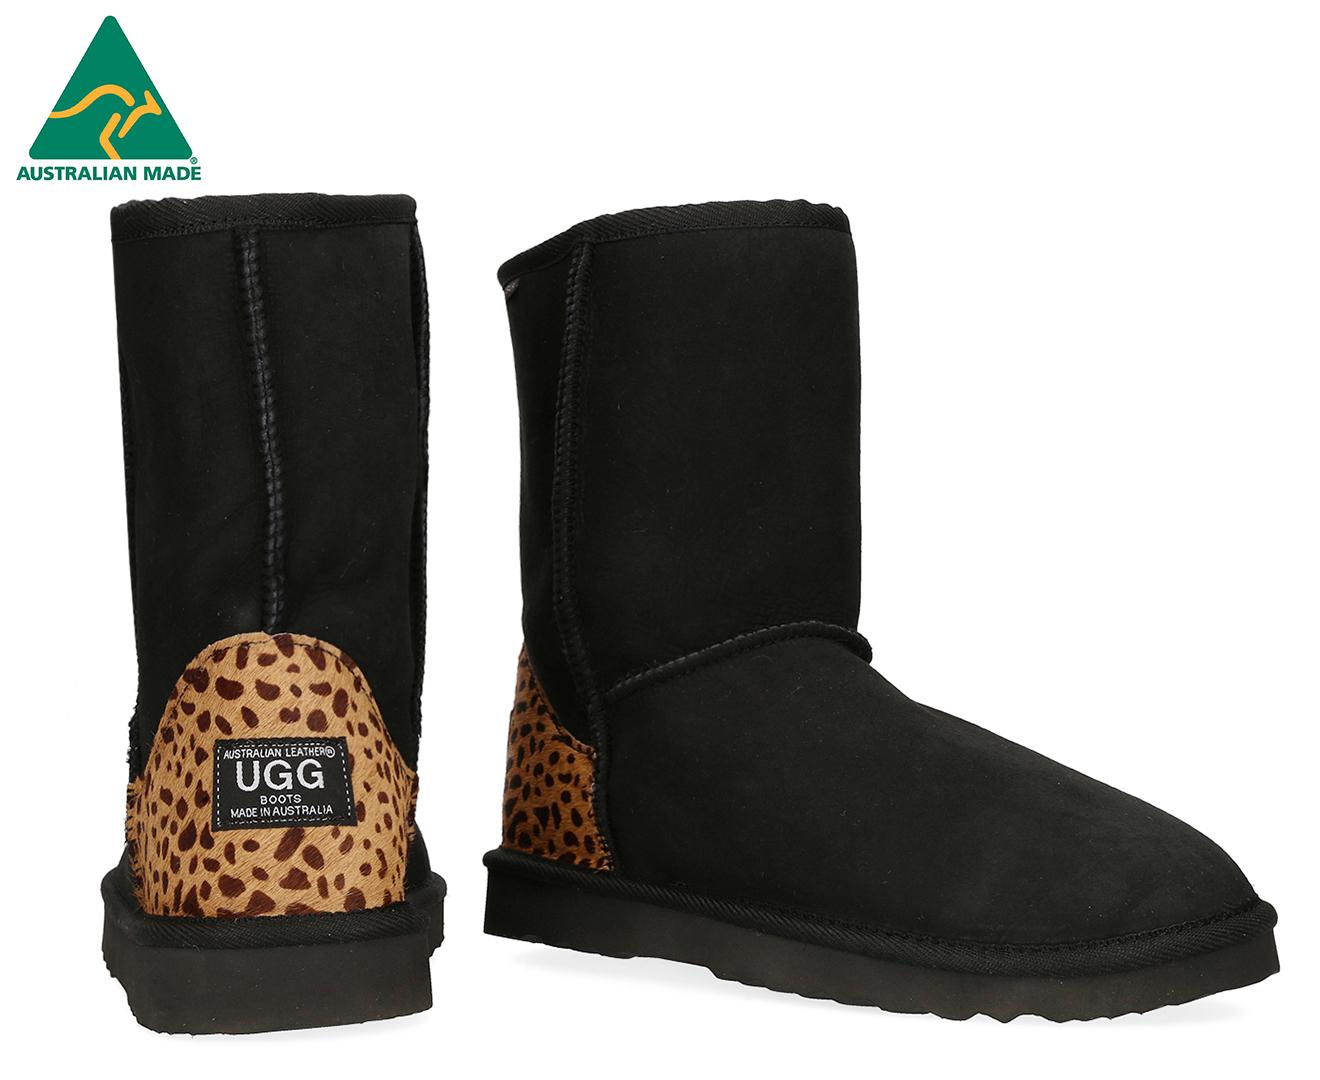 b5d8162d59f Australian Leather Classic Short Ugg Boot - Leopard Print/Black